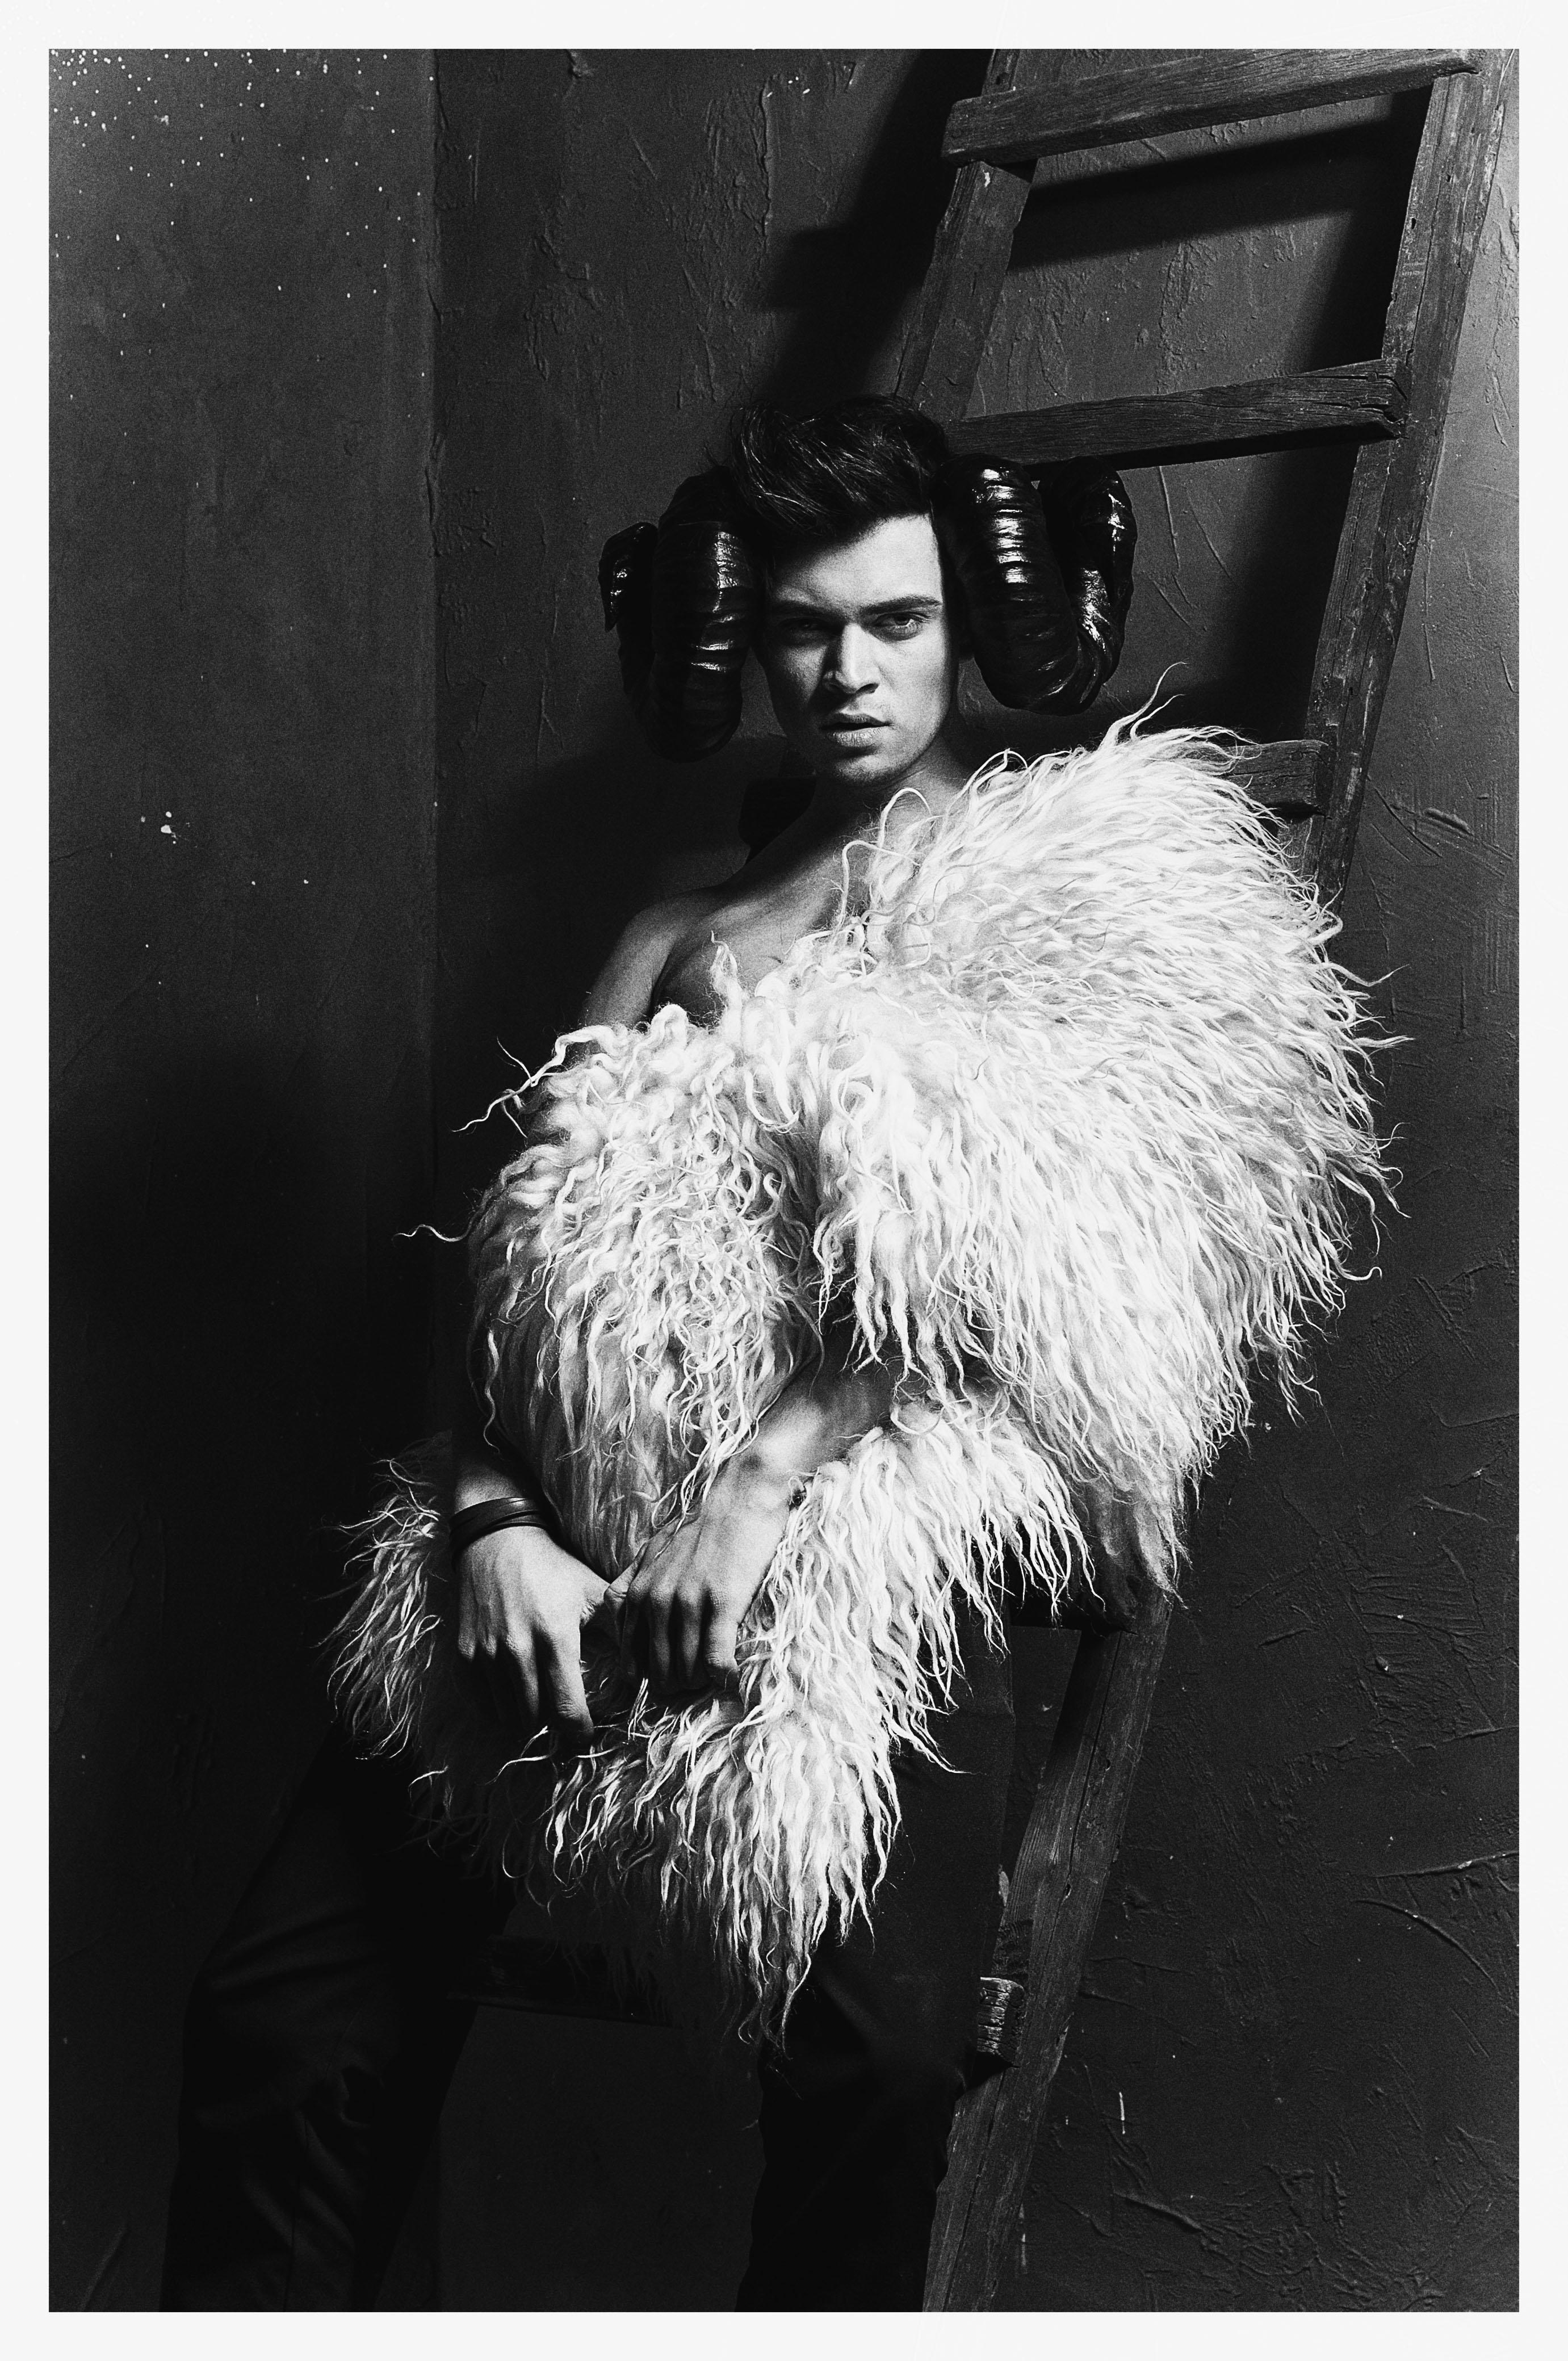 #monochrome #skin #sepia #toned #image #human #face #sleep #girl #model #fashion #young #light #women #cute #black #hair #white #beautiful #beauty #franpolonskiy #france #franpolonskiyphotographer #phfranpolonskiy #mood, Фран Полонский